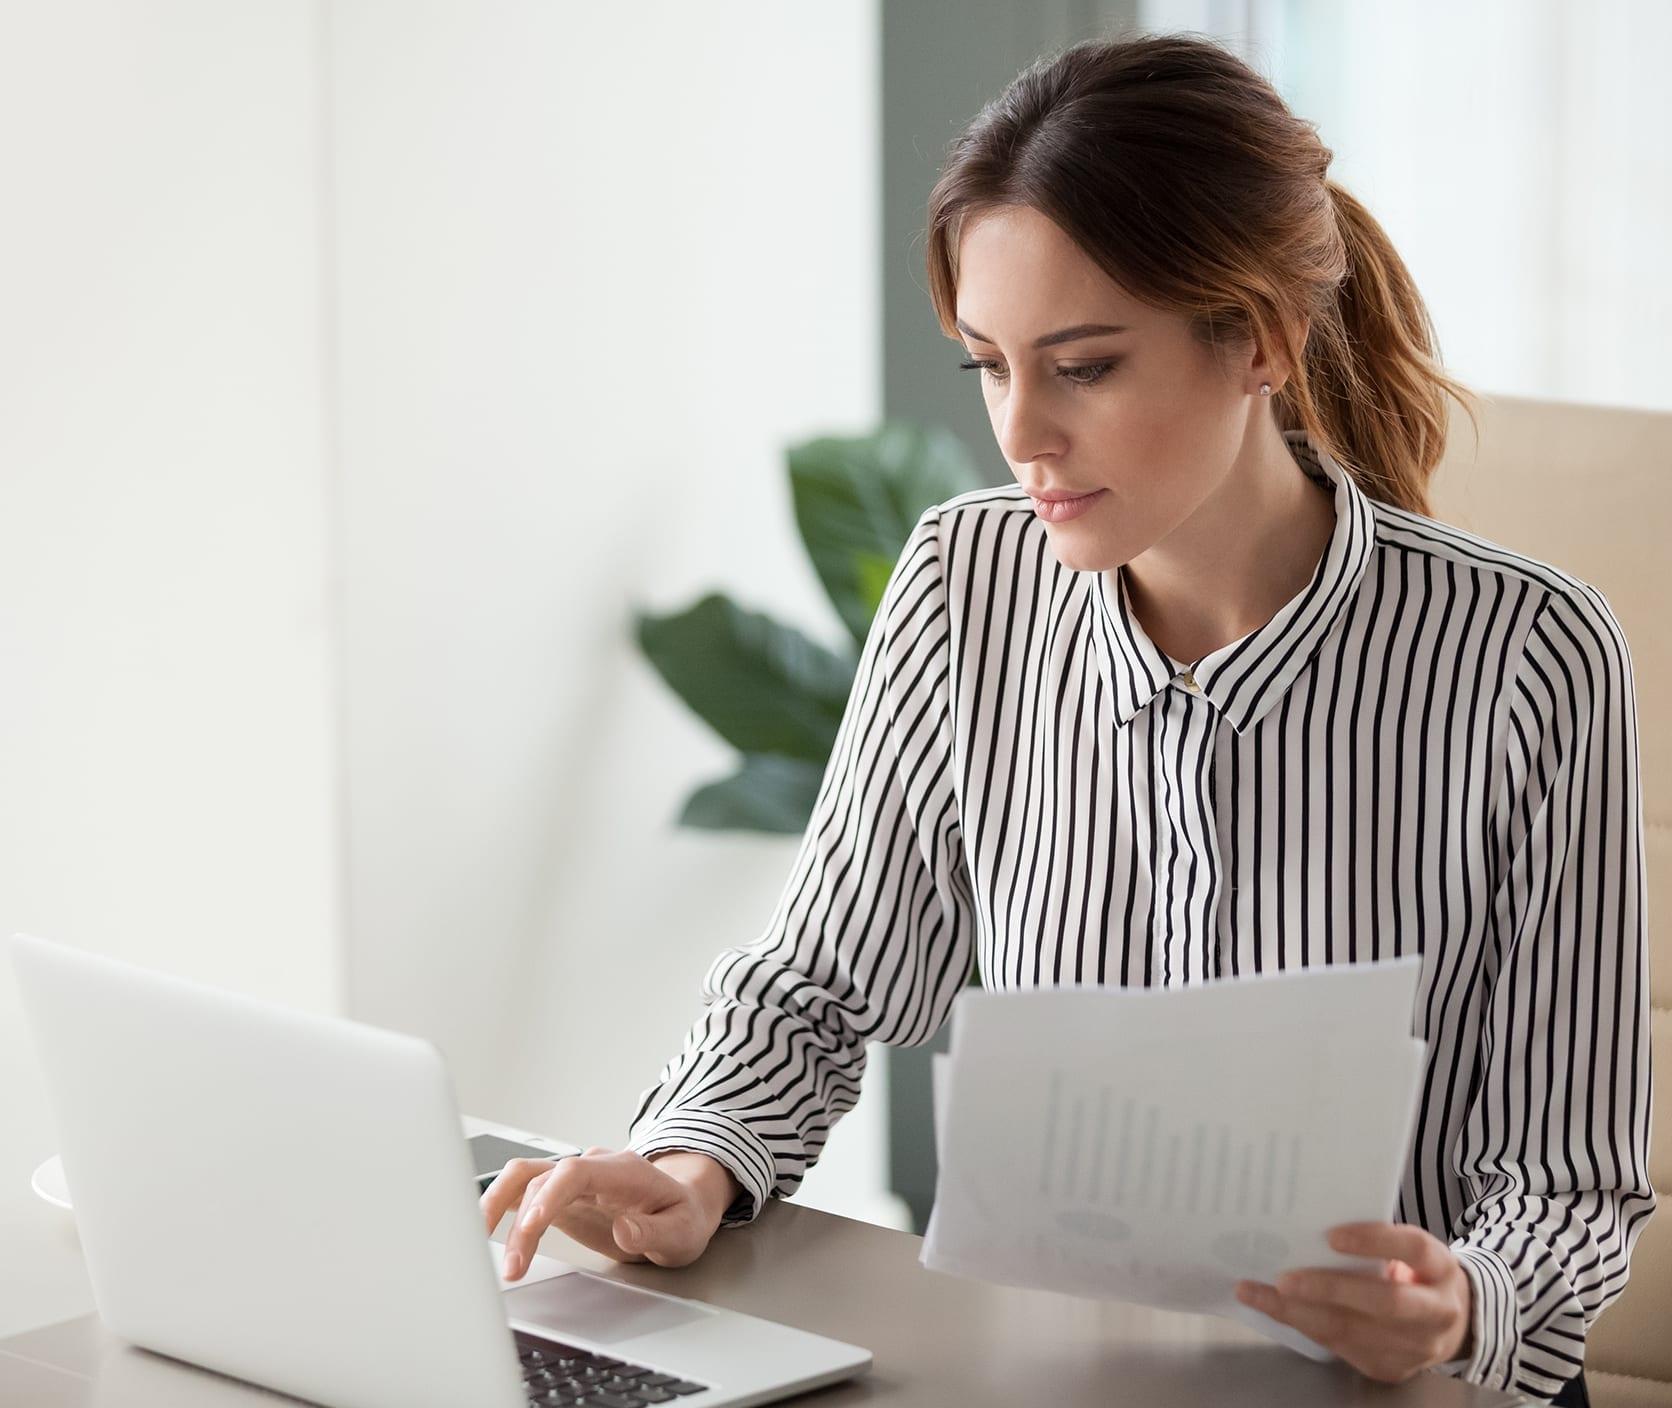 woman on laptop analyzing spending